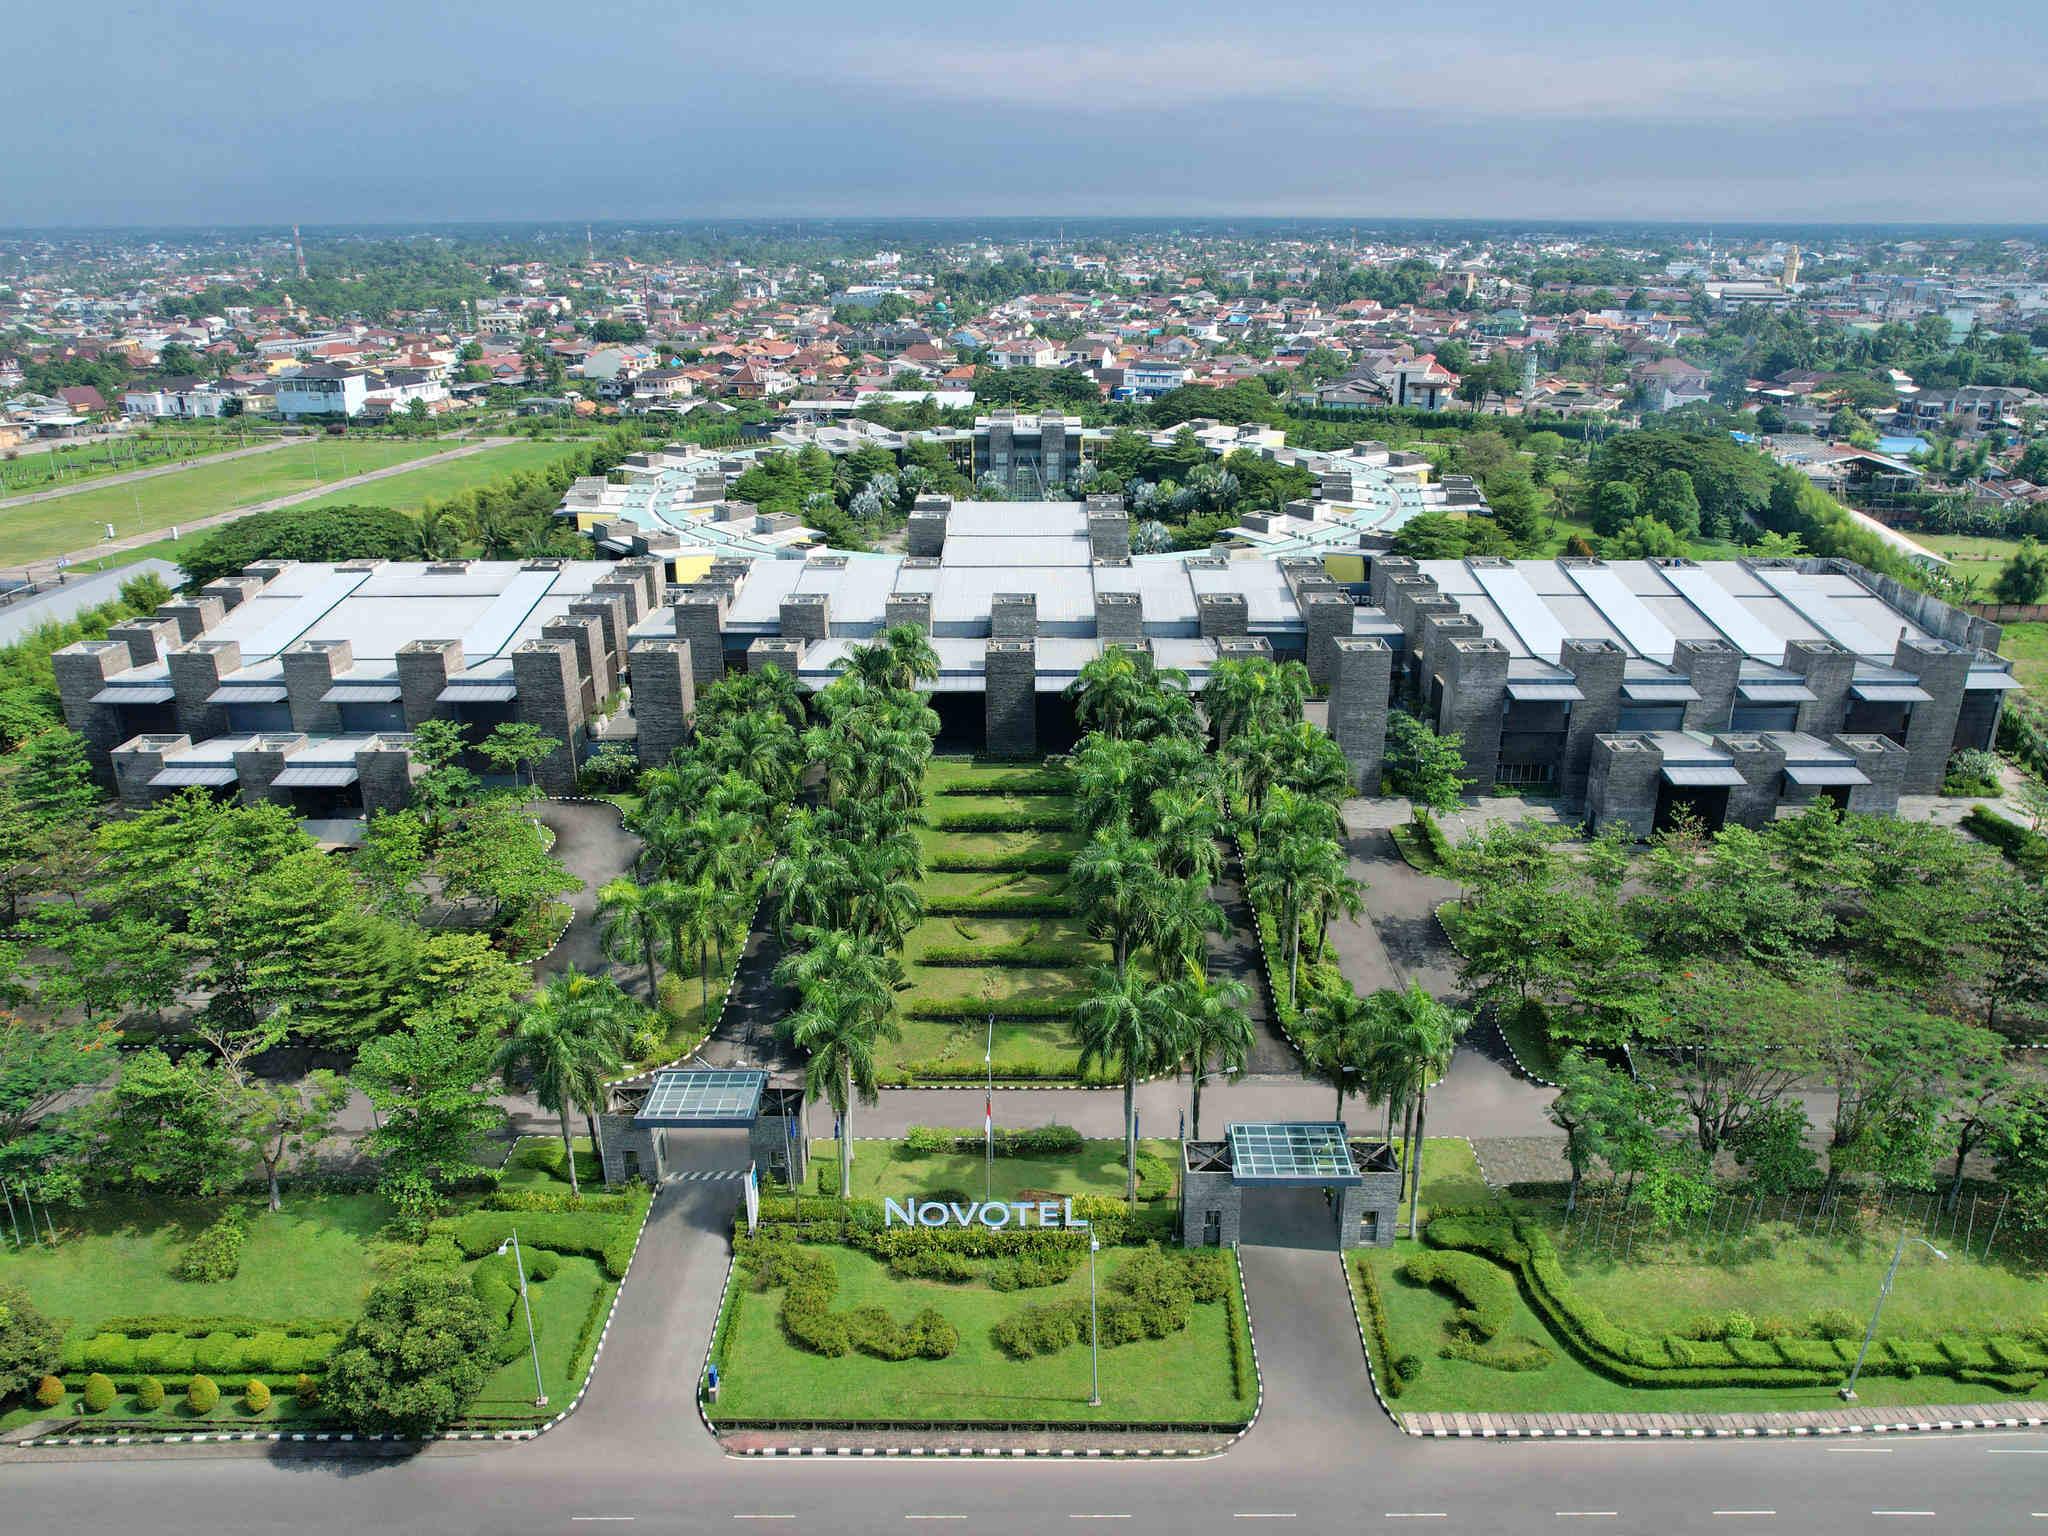 Hotell – Novotel Palembang - Hotel & Residence